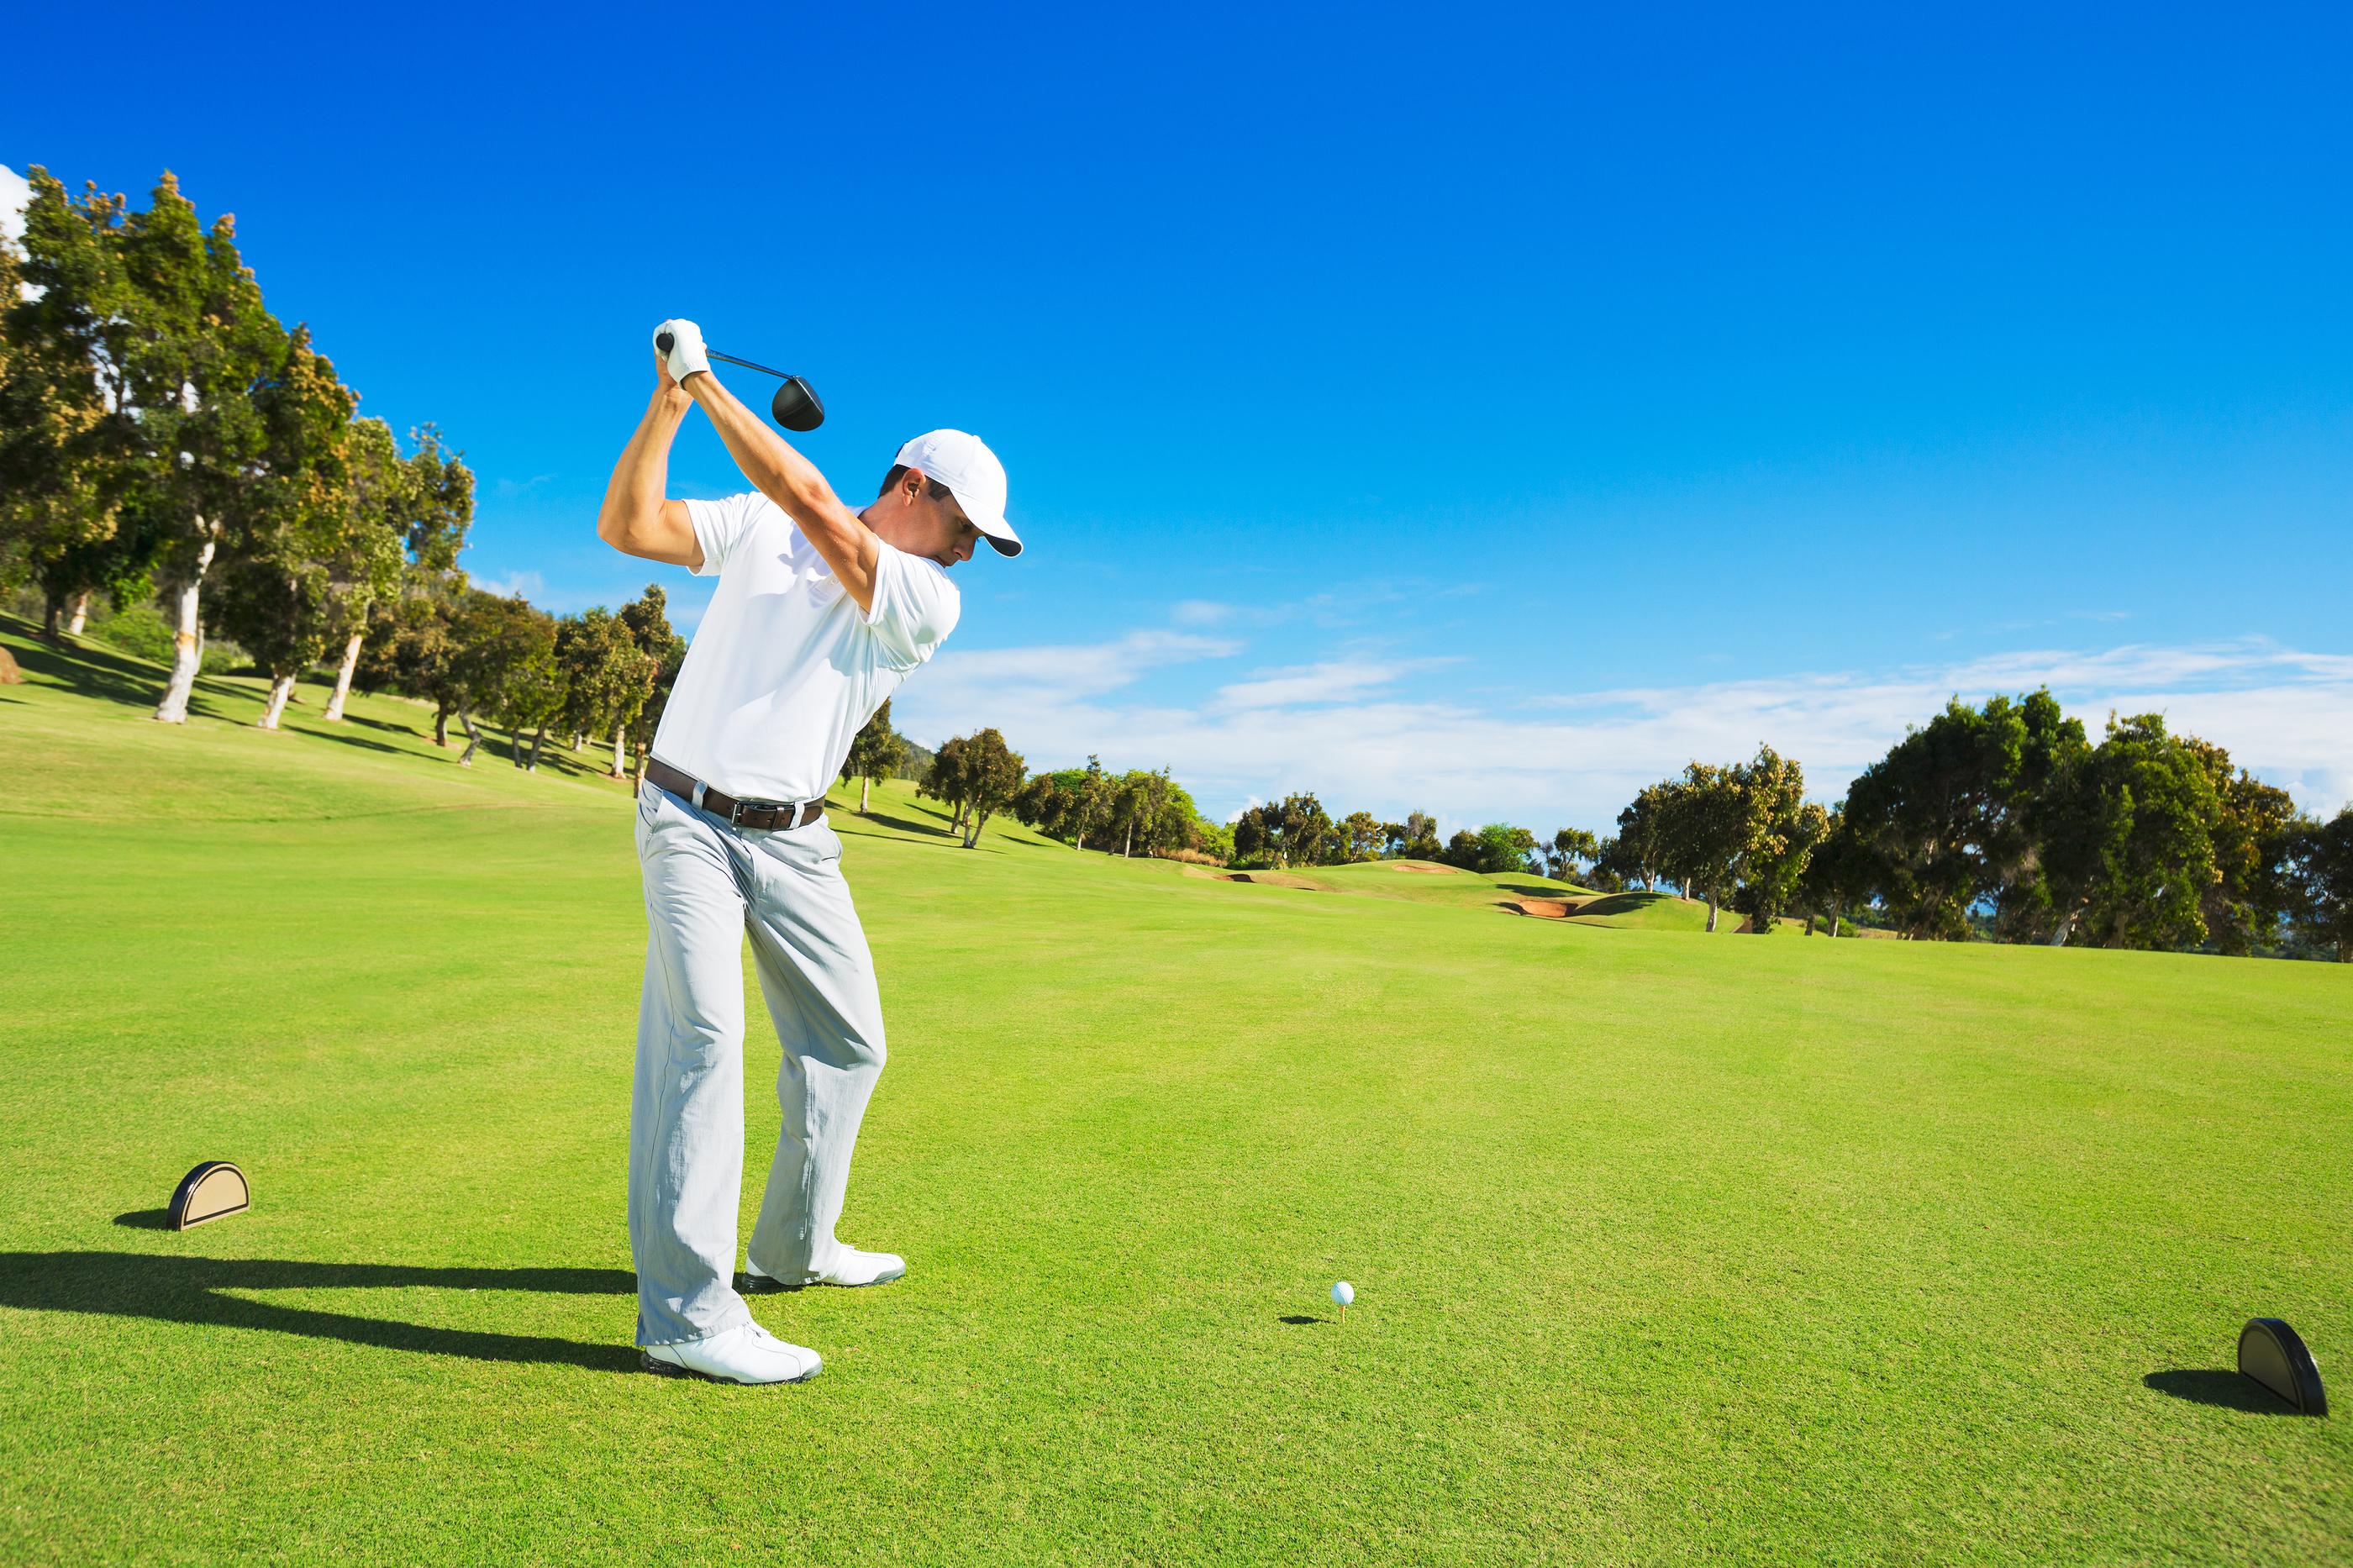 Golf player teeing off. Man hitting golf ball from tee box ...